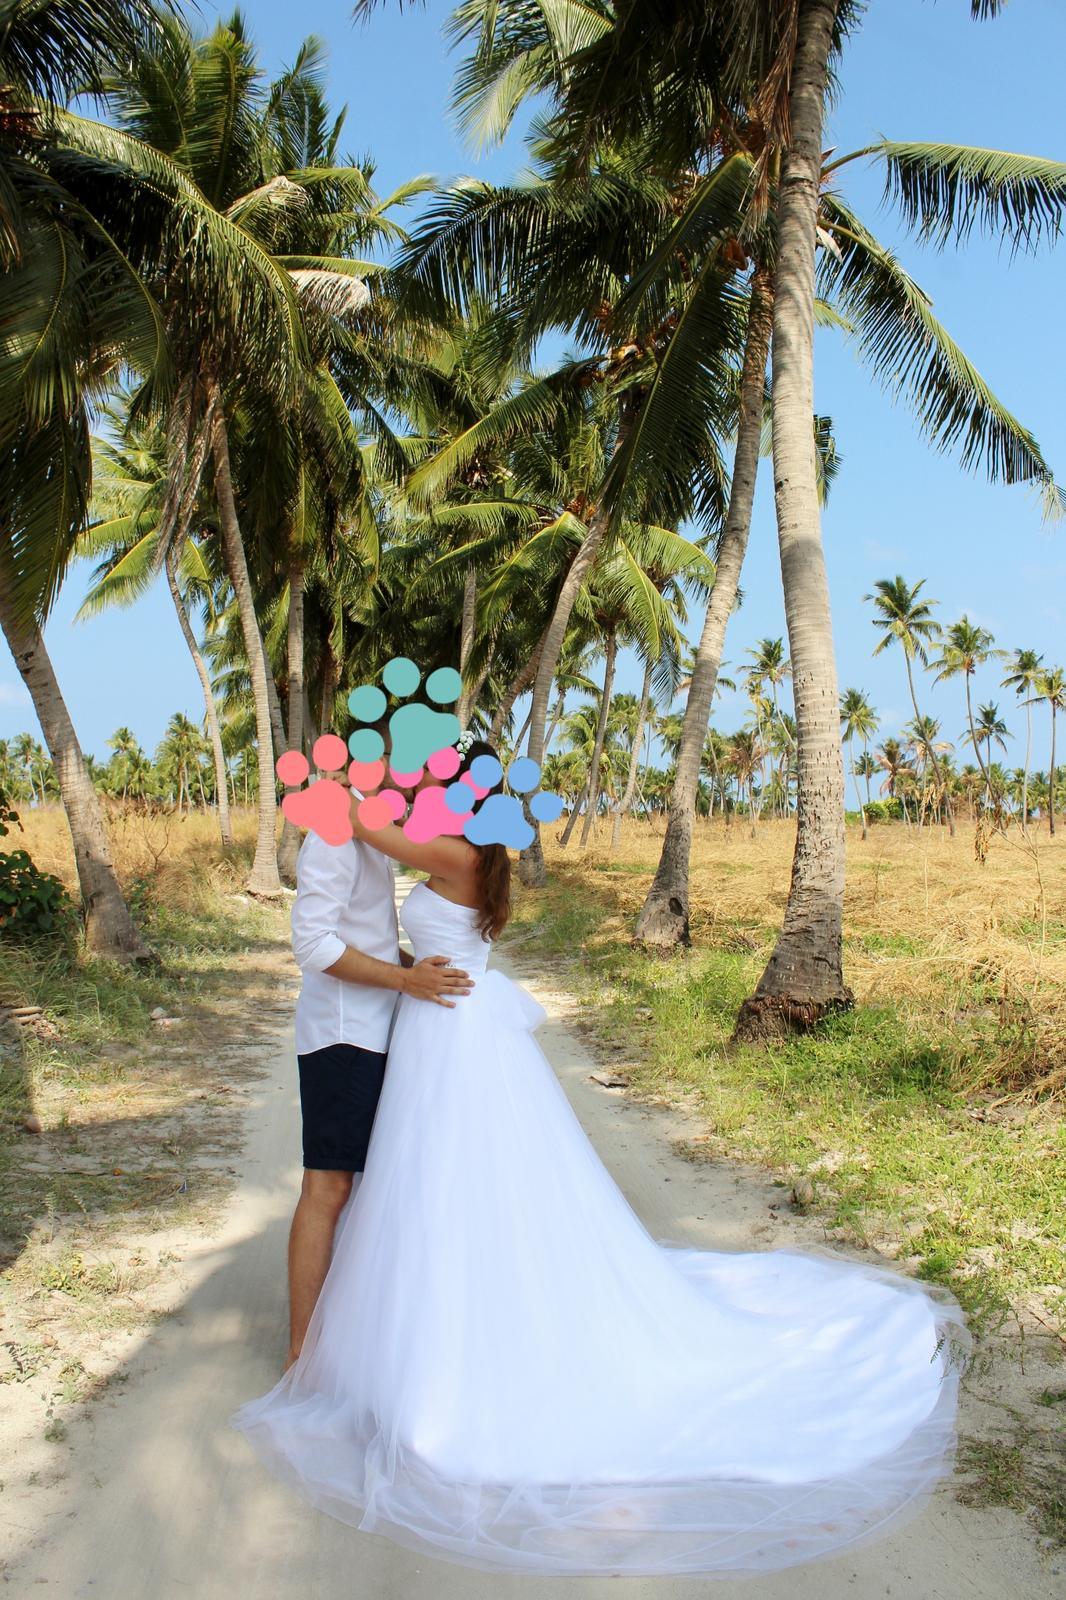 Svadobné šaty s vlečkou - Obrázok č. 3